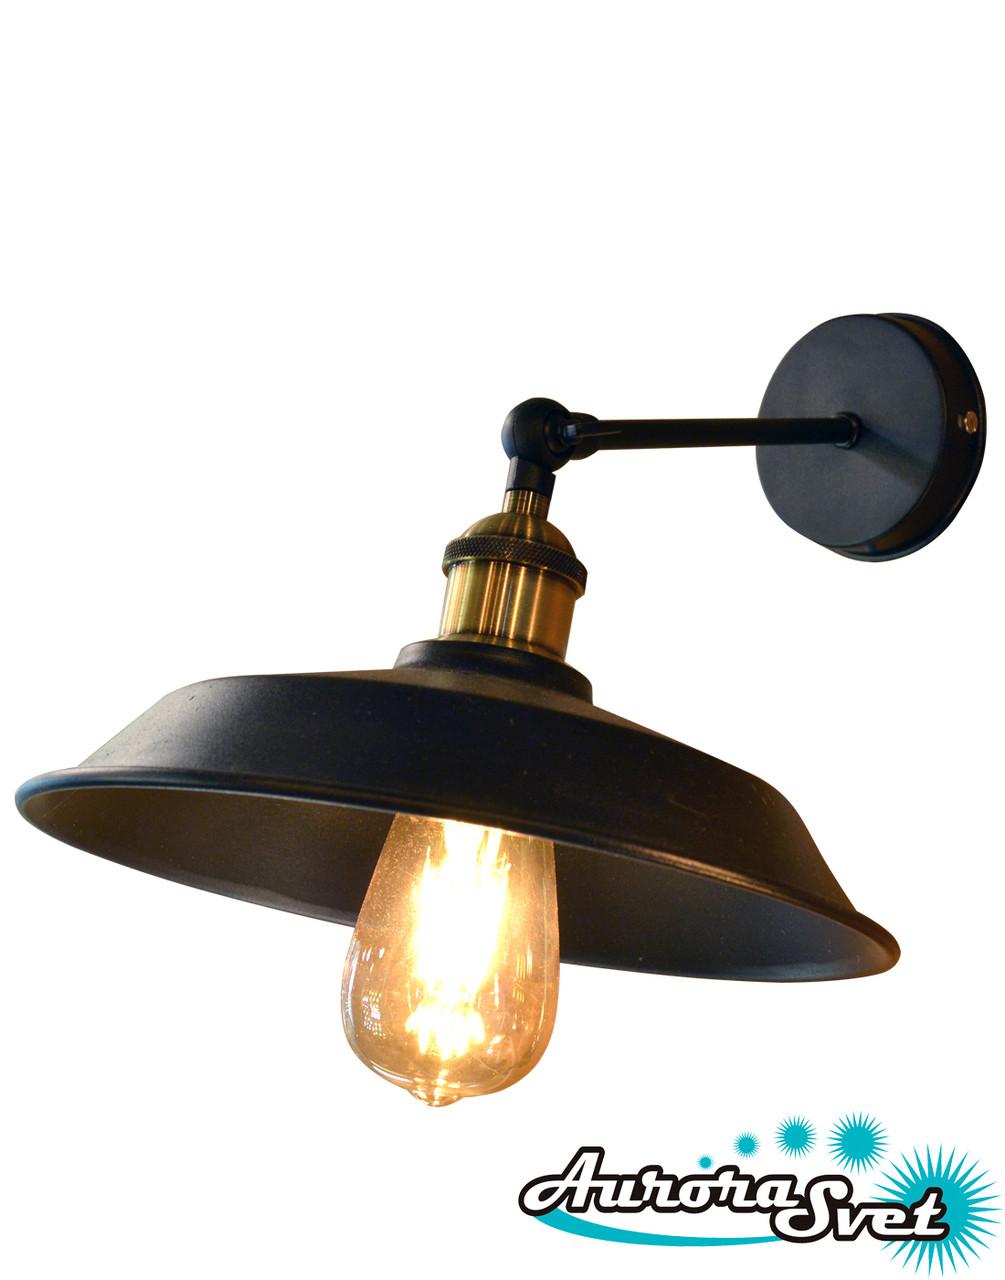 Бра настенная AuroraSvet loft 9300 чёрная. LED светильник бра. Светодиодный светильник бра.